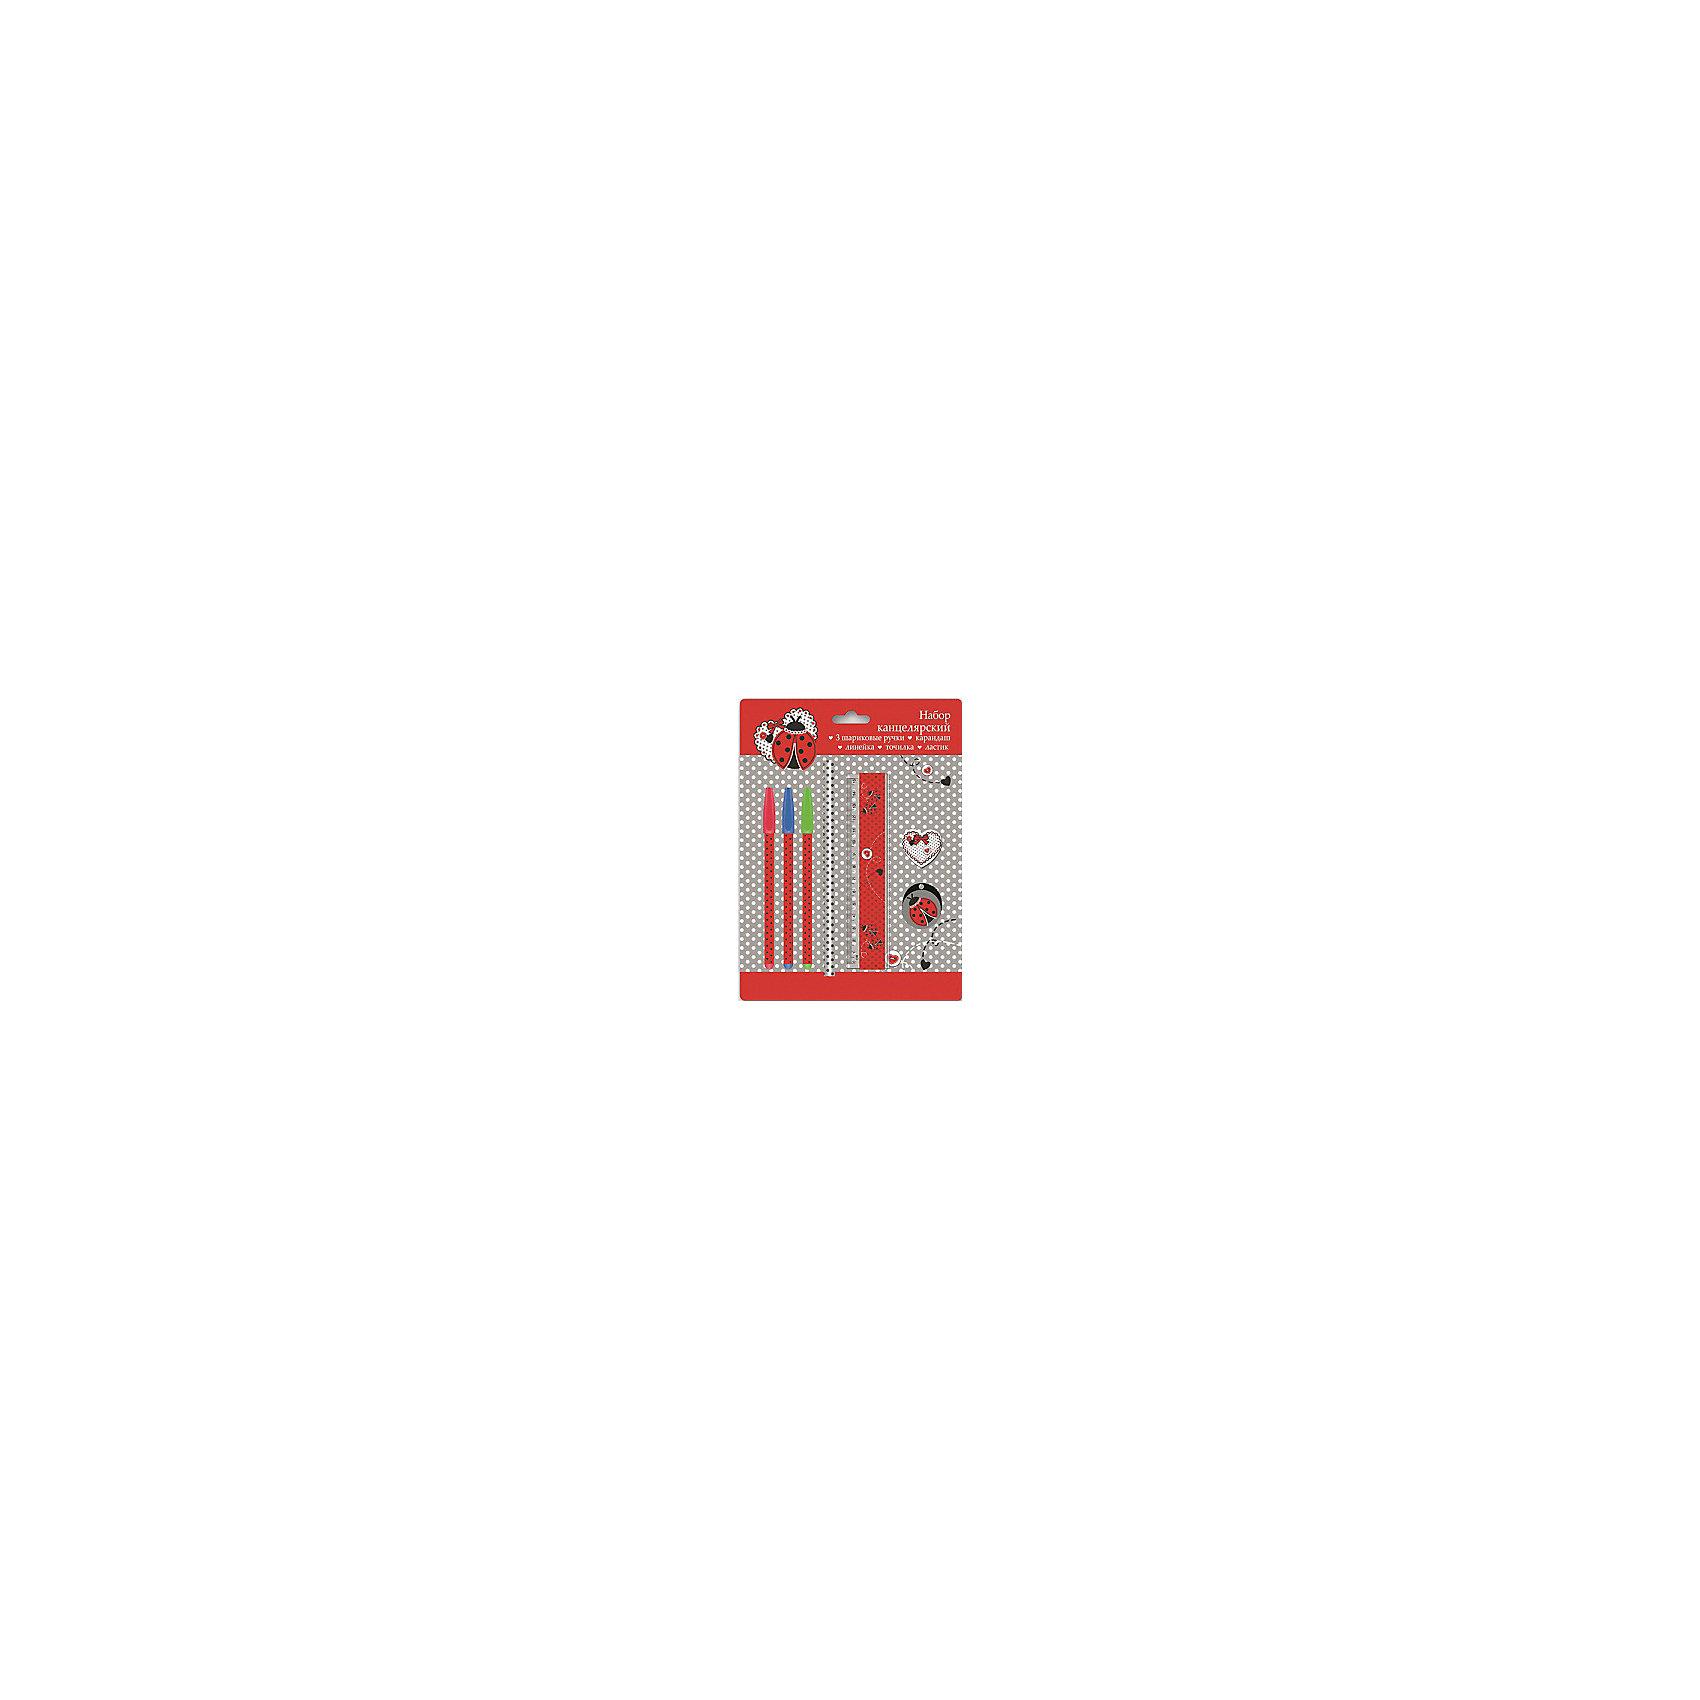 Феникс+ Канцелярский набор Божья коровка, 7 предметов академия групп канцелярский набор точилка ластик barbie